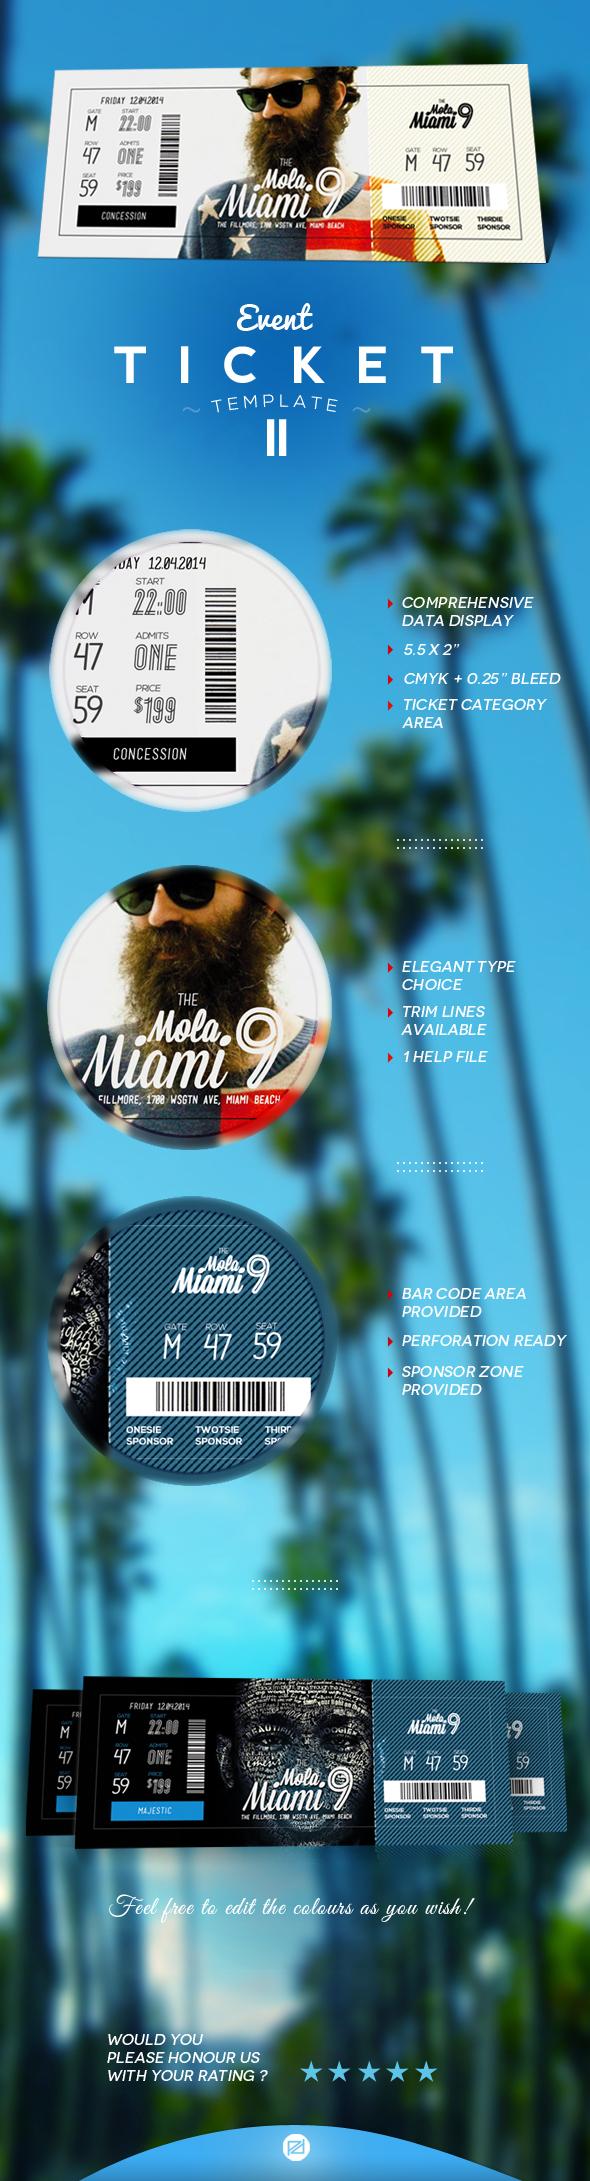 event ticket template by patoo design via behance billet event